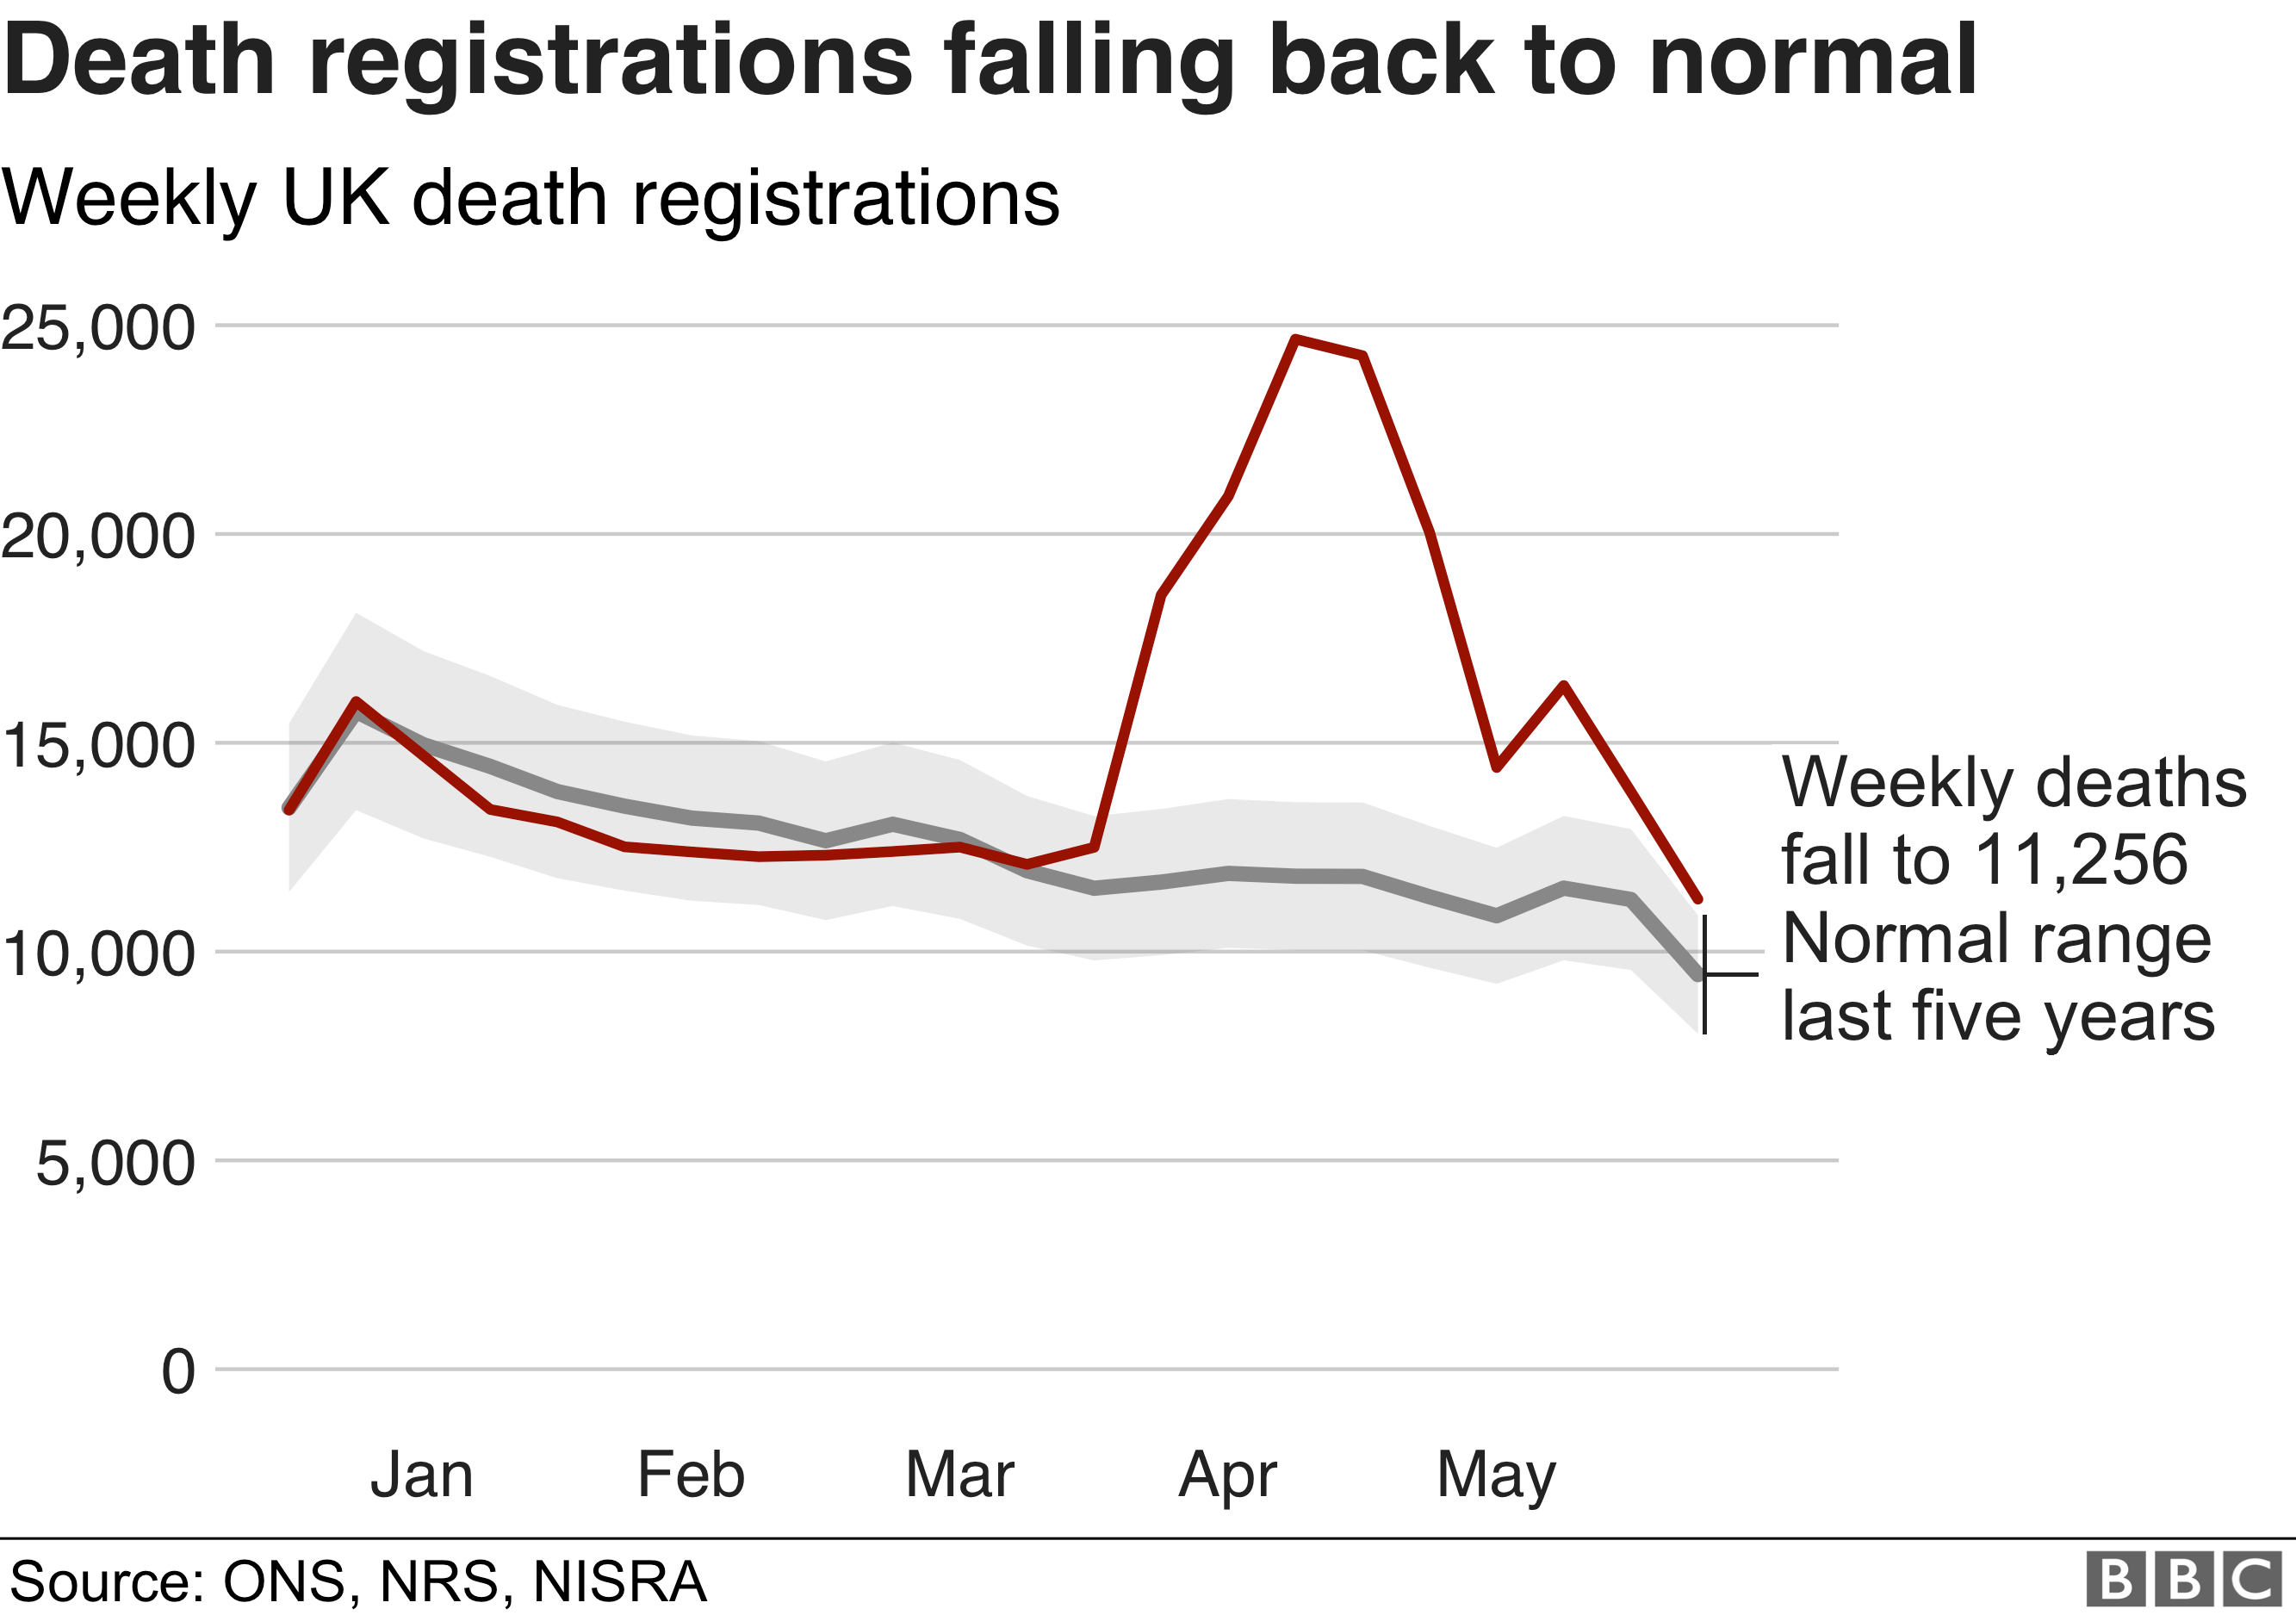 Coronavirus Weekly Death Figures Continue To Fall Bbc News